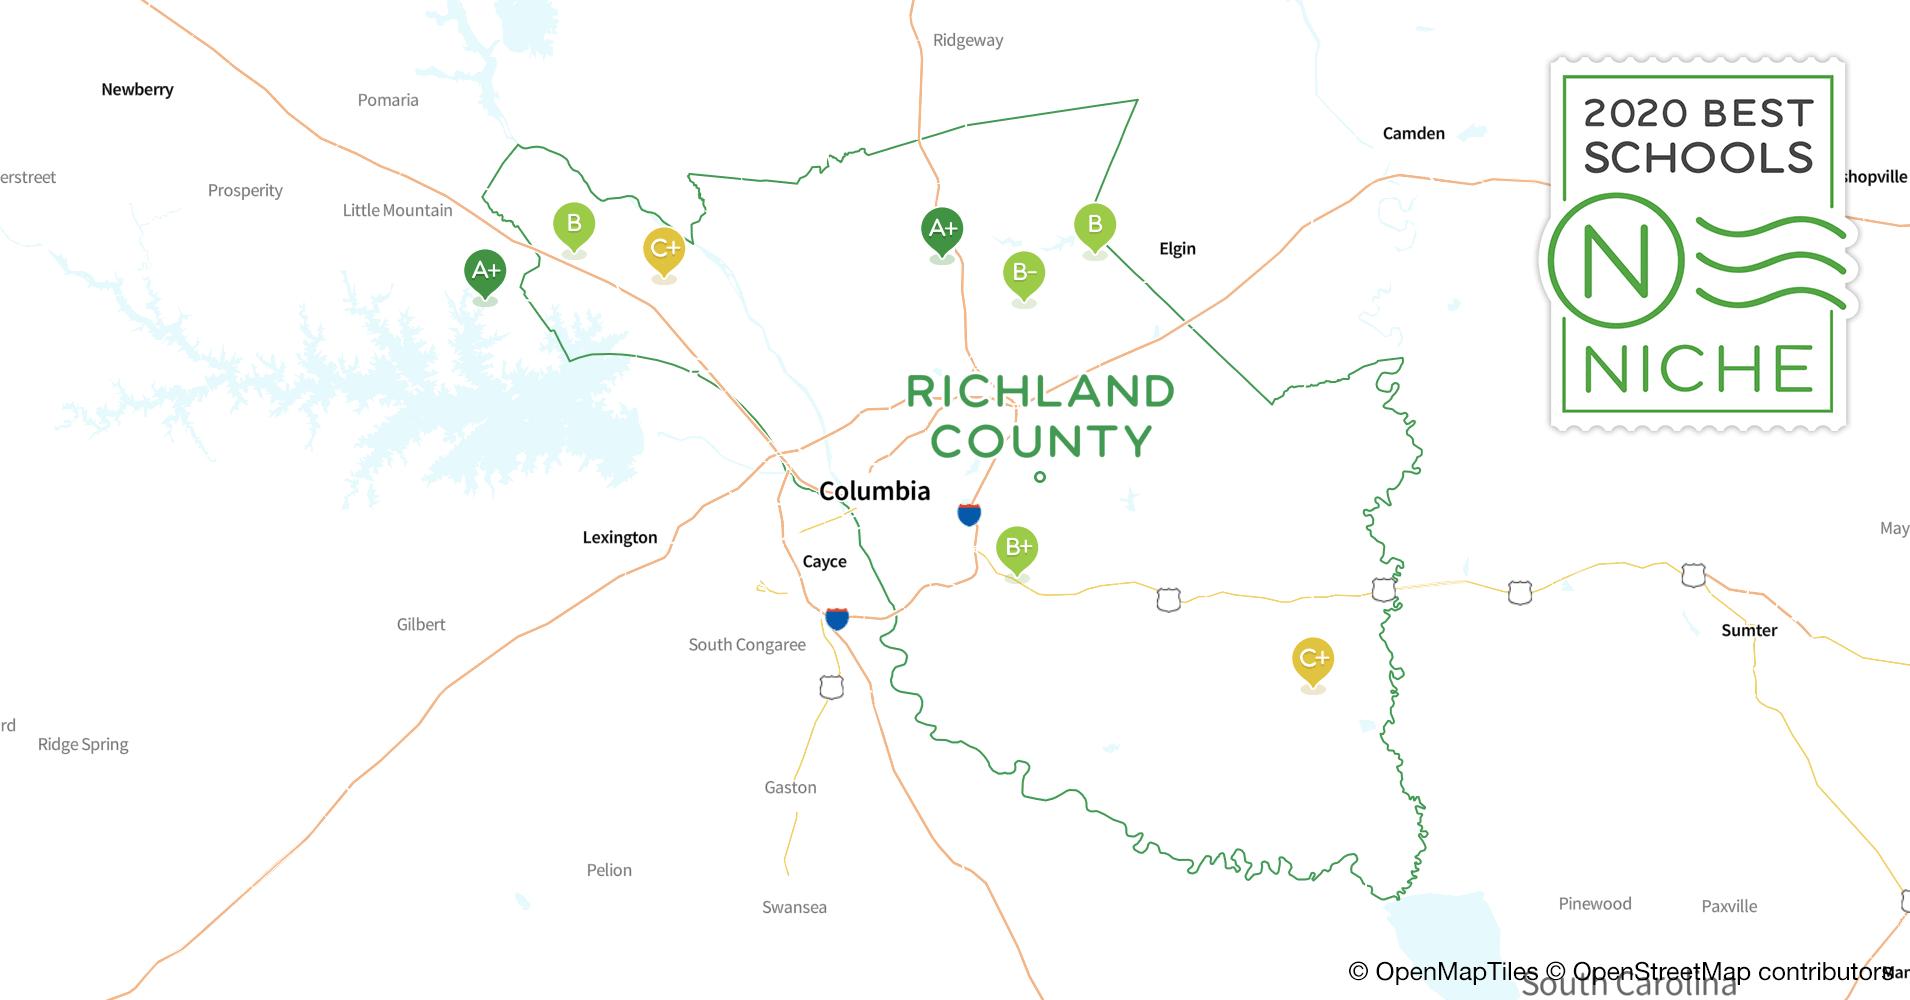 2020 Best Public Elementary Schools in Richland County, SC - Niche